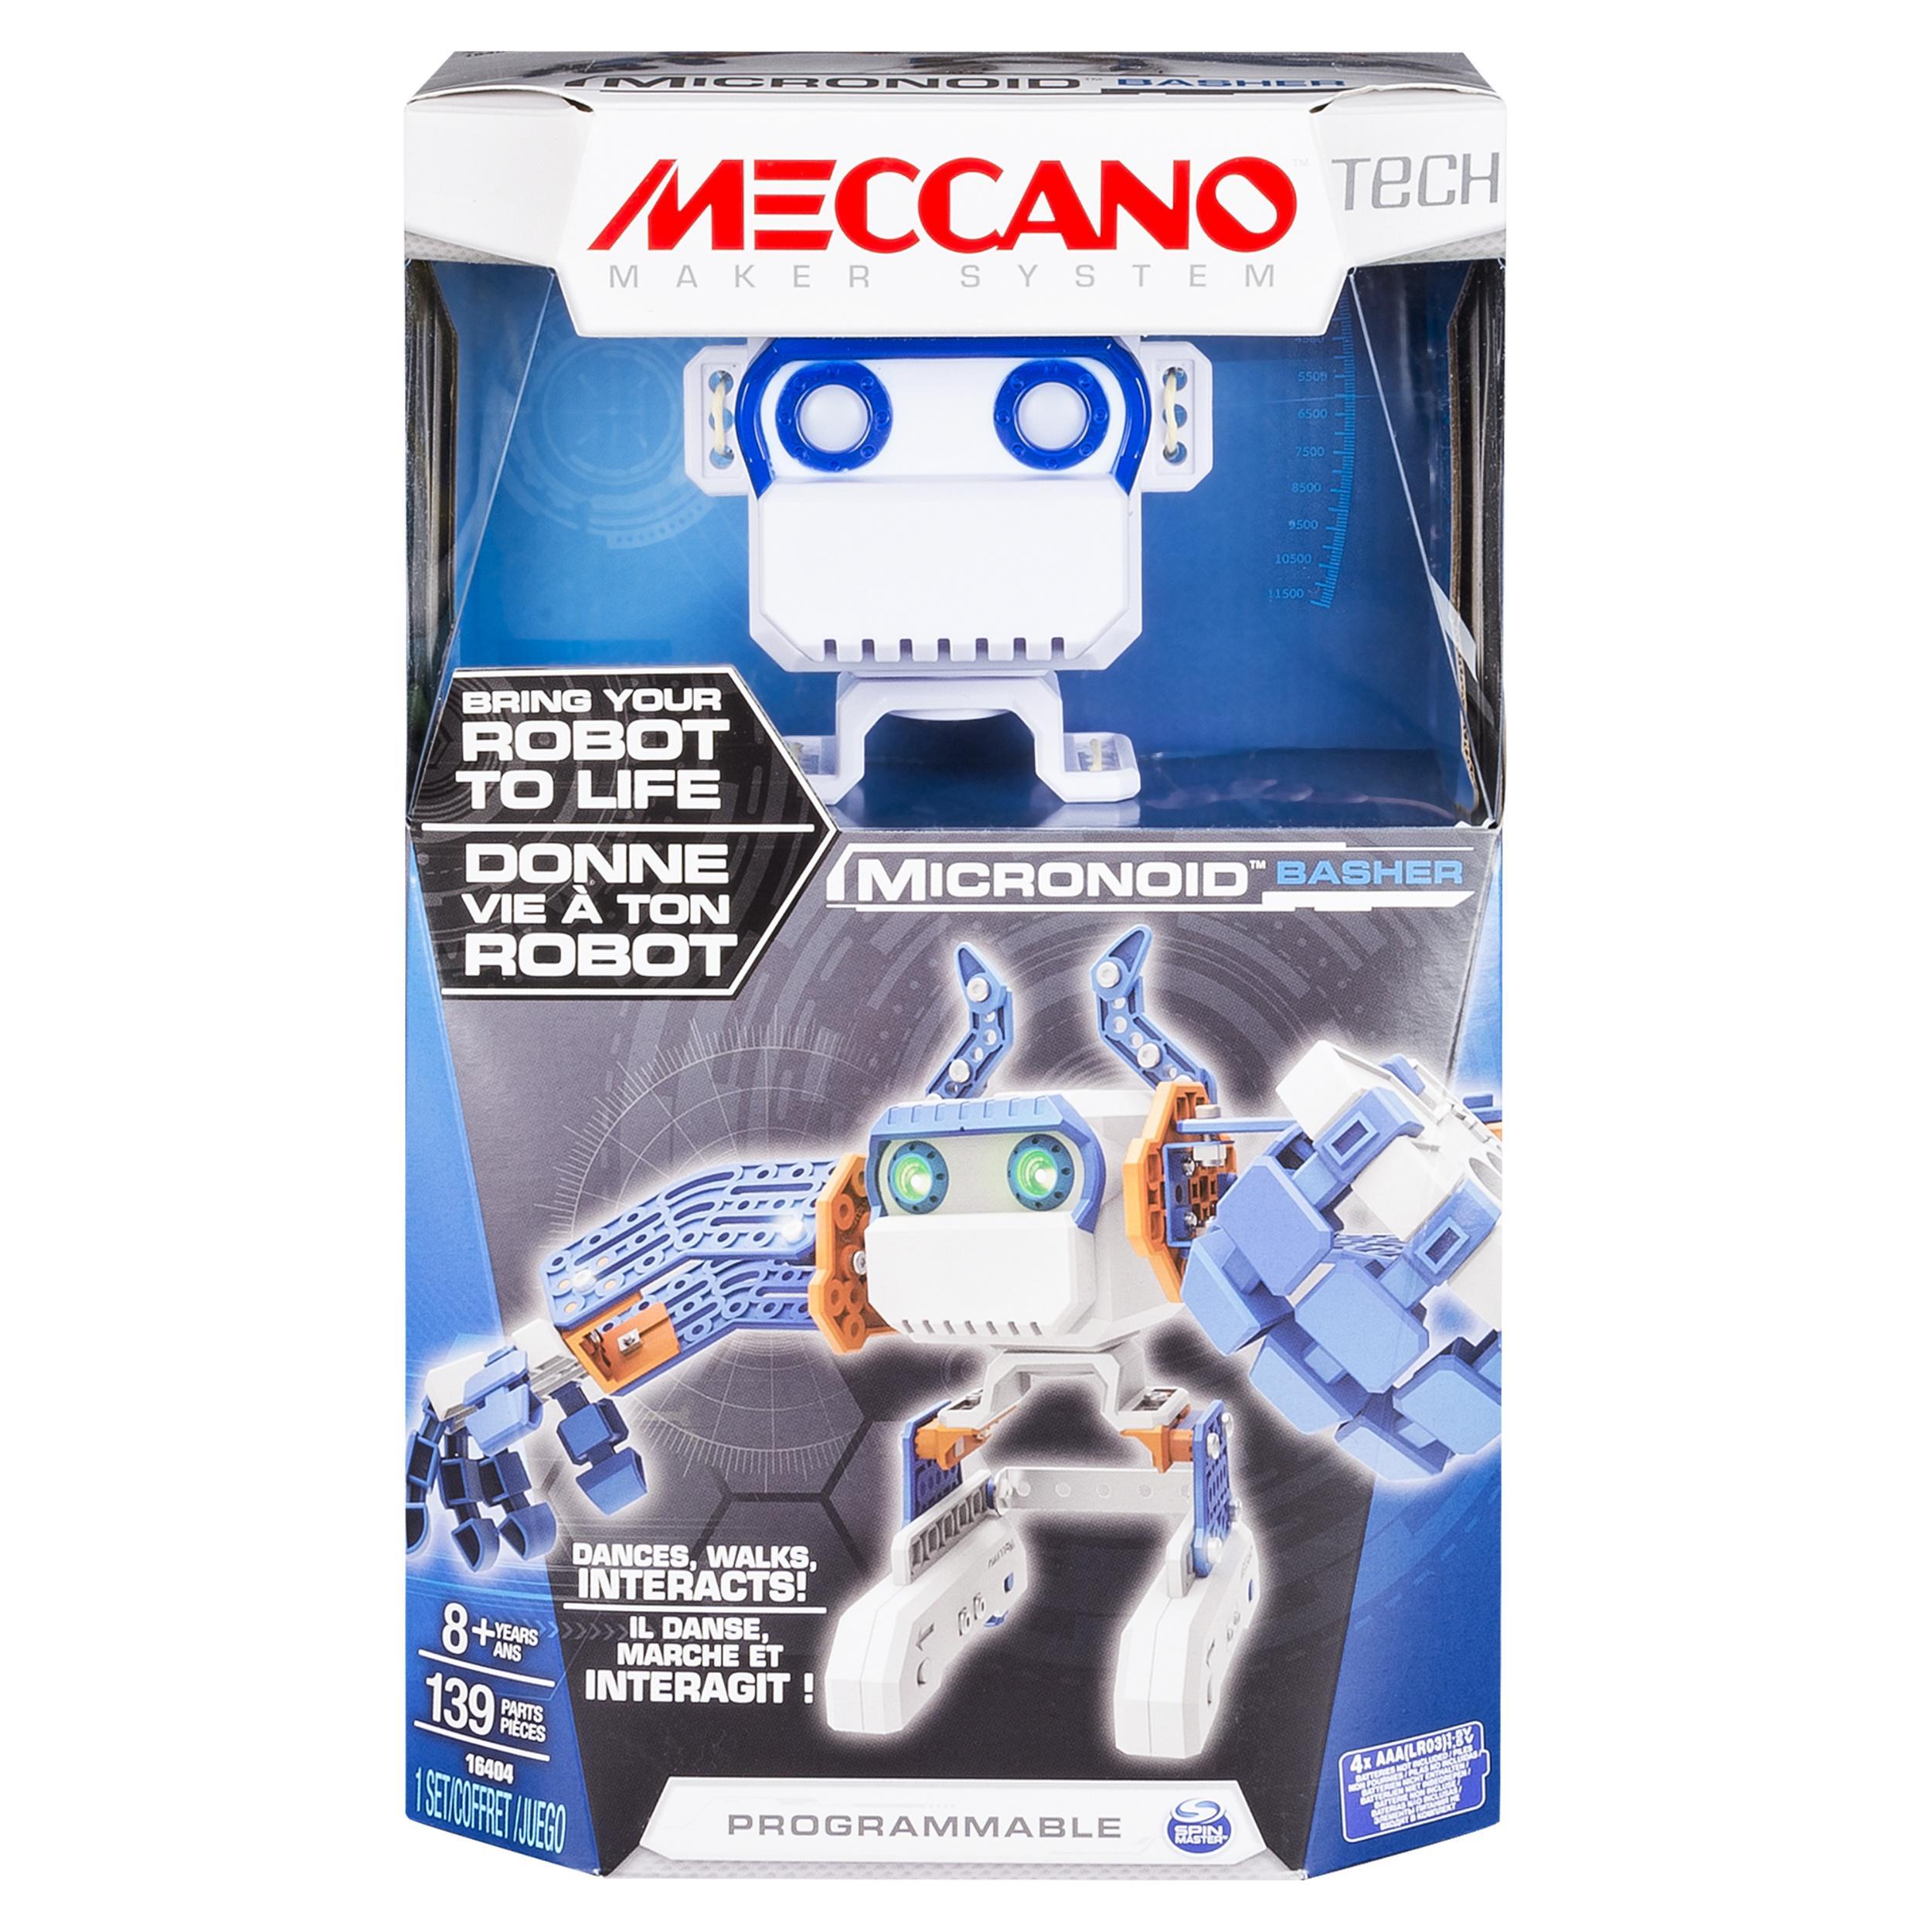 Amazon.com: Meccano - MicroNoid - Blue Basher: Toys & Games